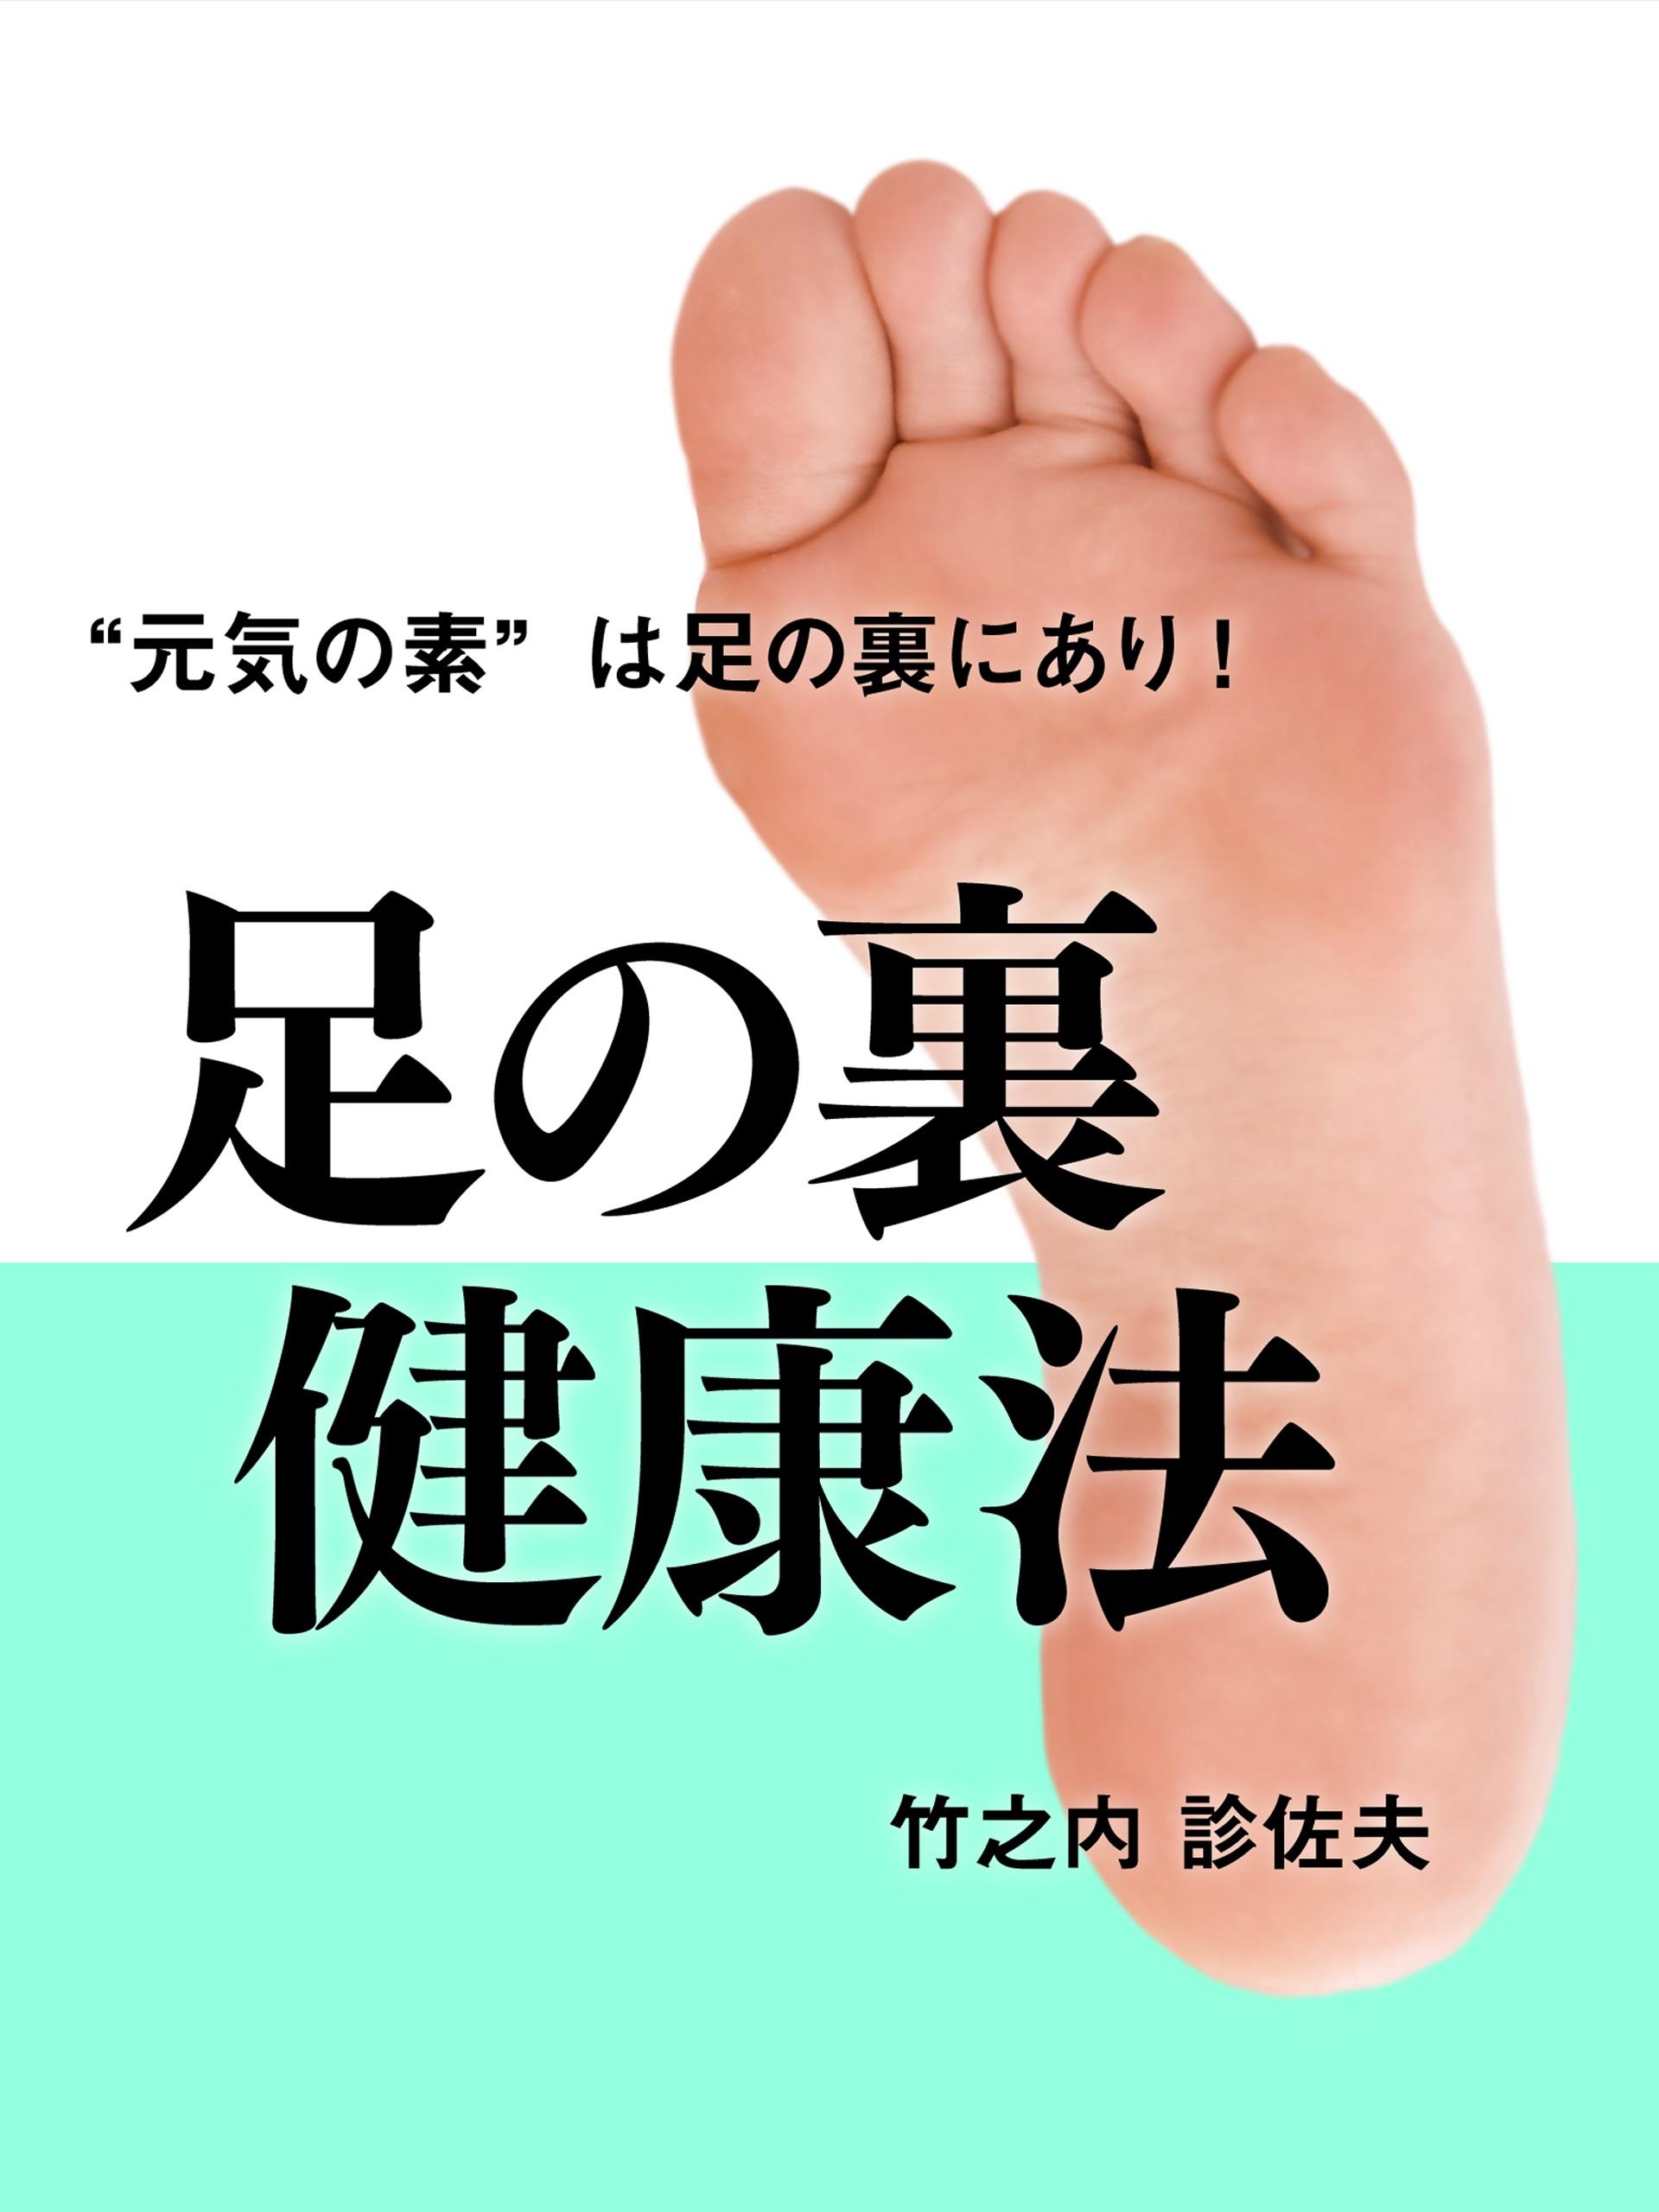 足の裏健康法